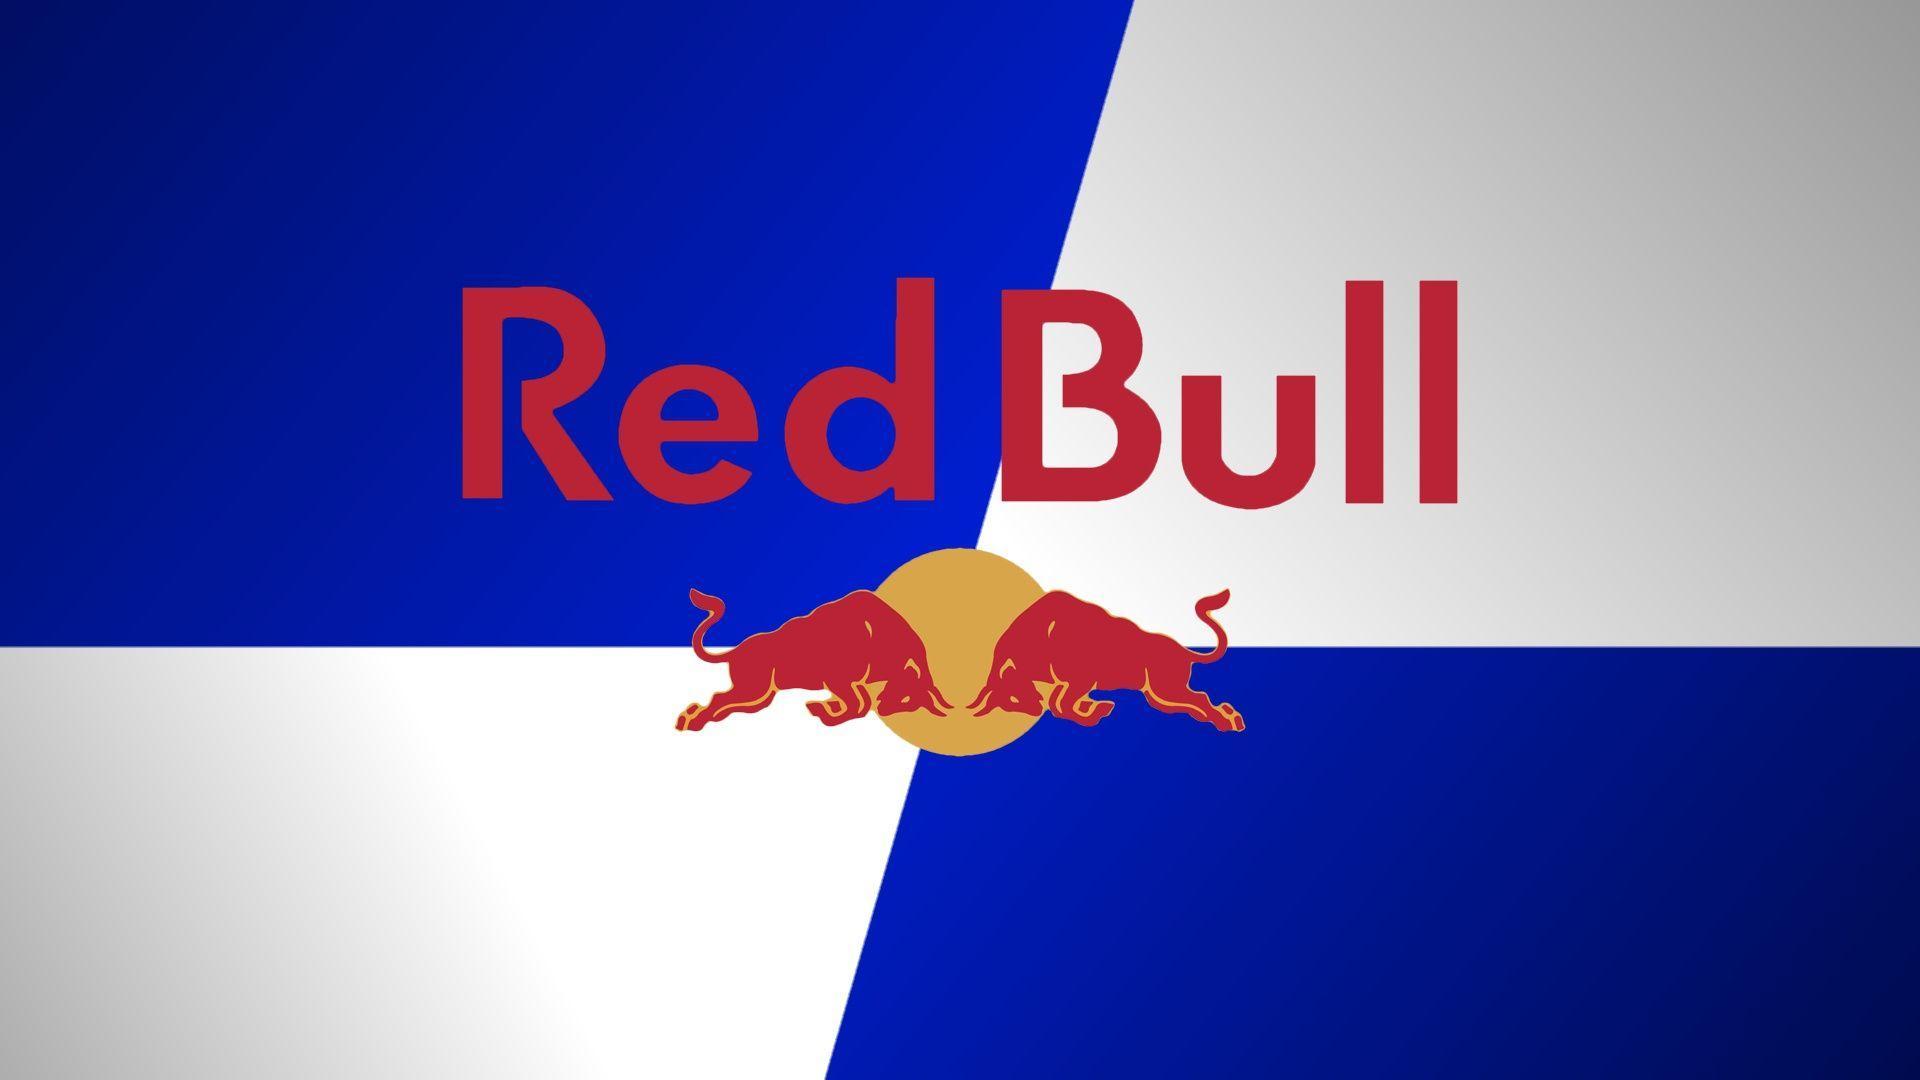 Red Bull Logo Hd Wallpaper Red Bull 1000249 Hd